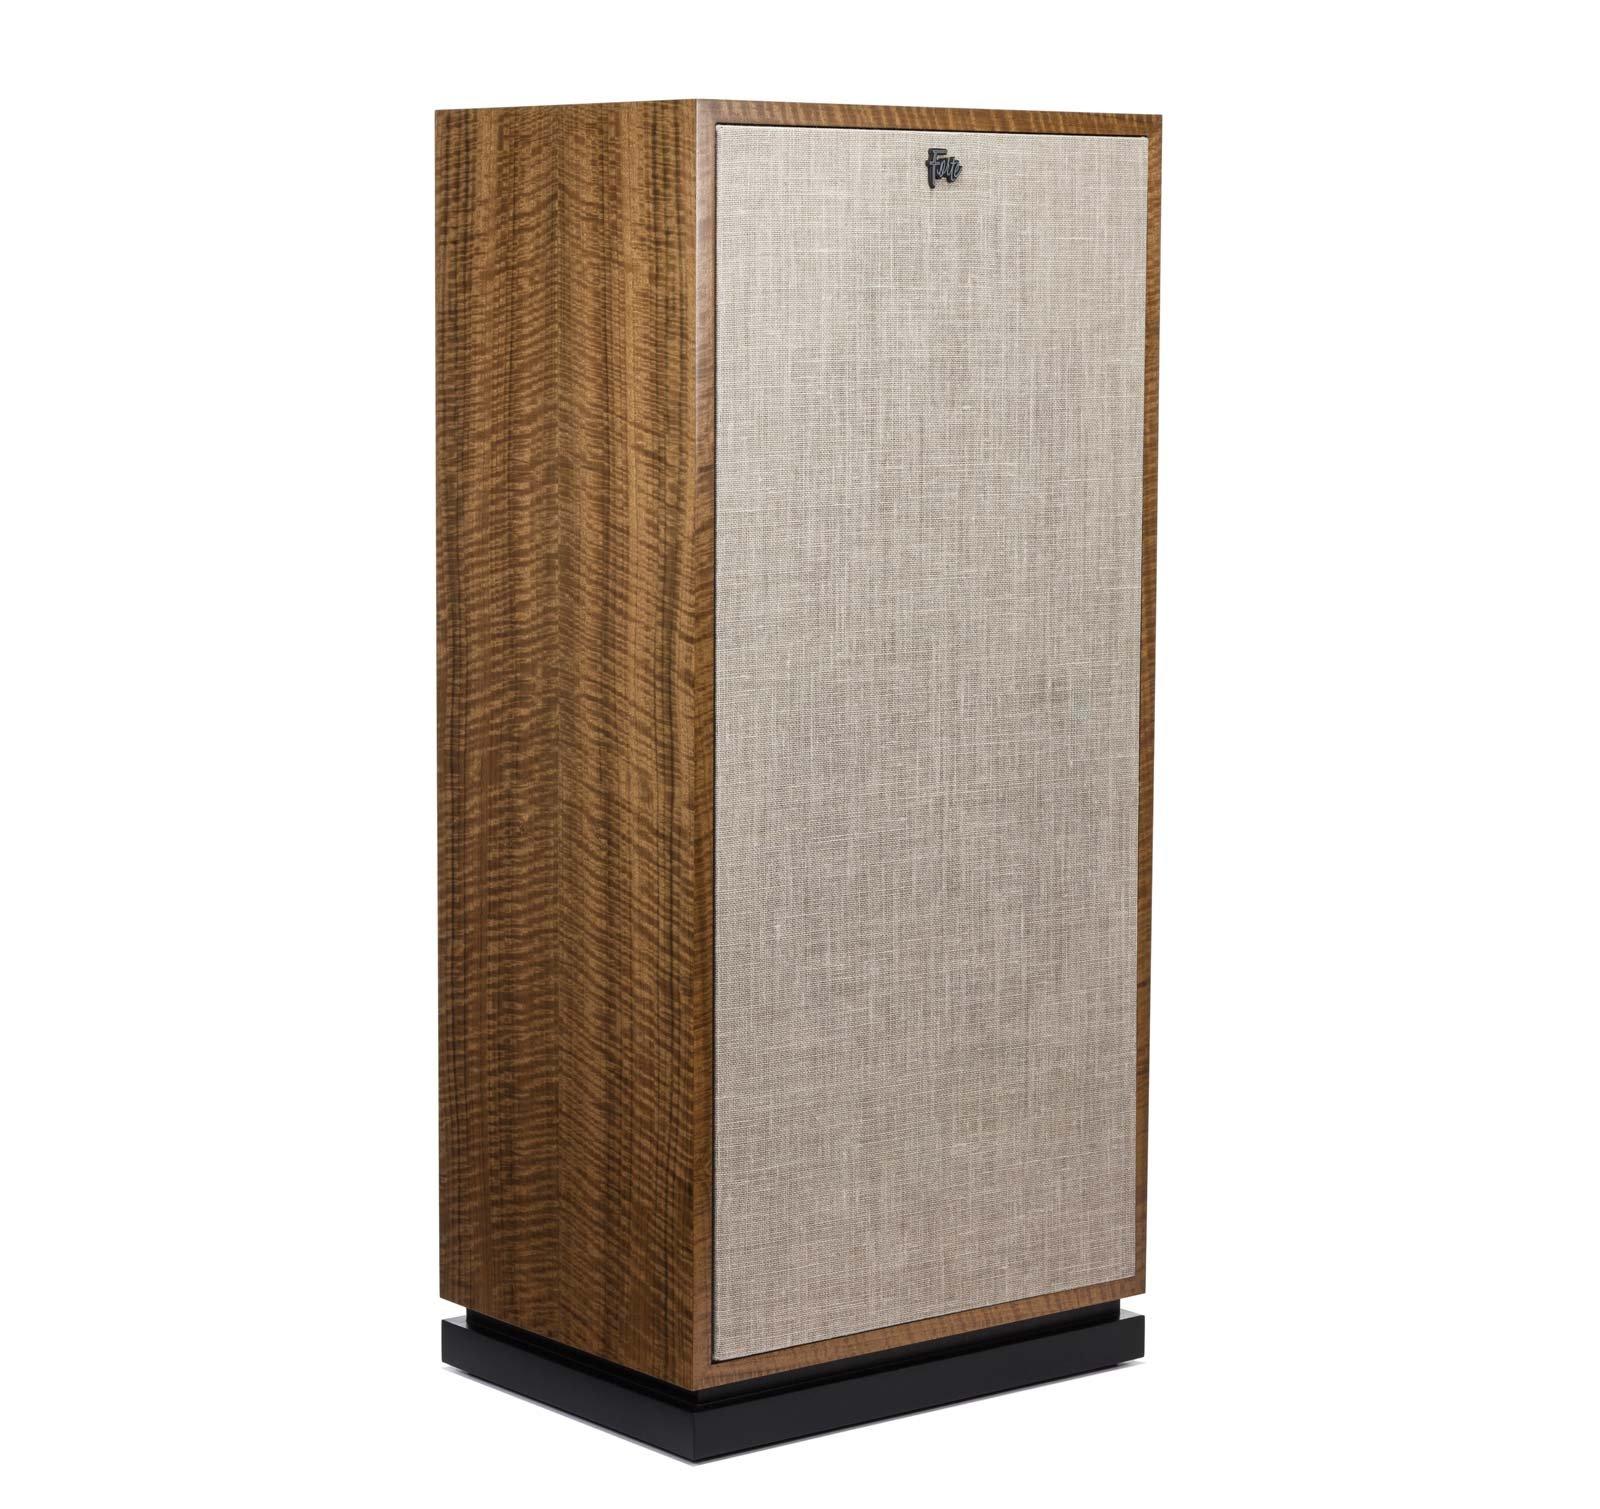 Klipsch Forte III Heritage Series Tower Speaker - Single (Walnut)